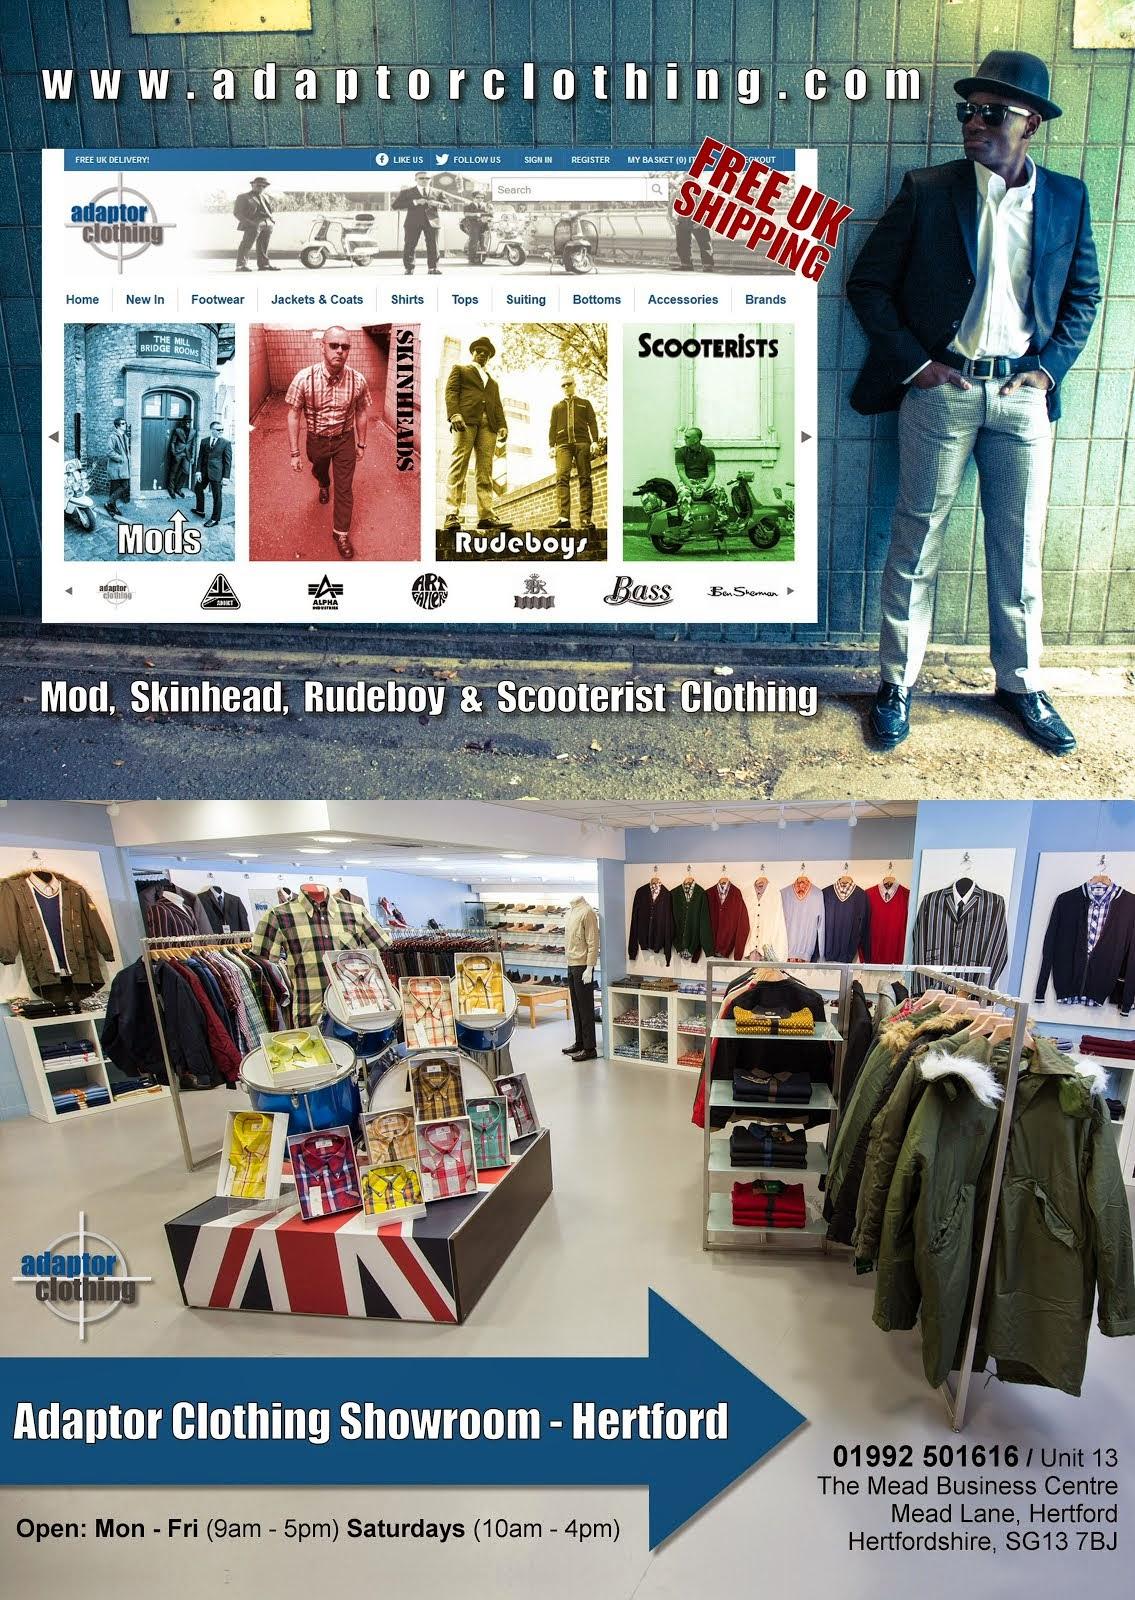 Adaptor Clothing - Proudly Sponsoring